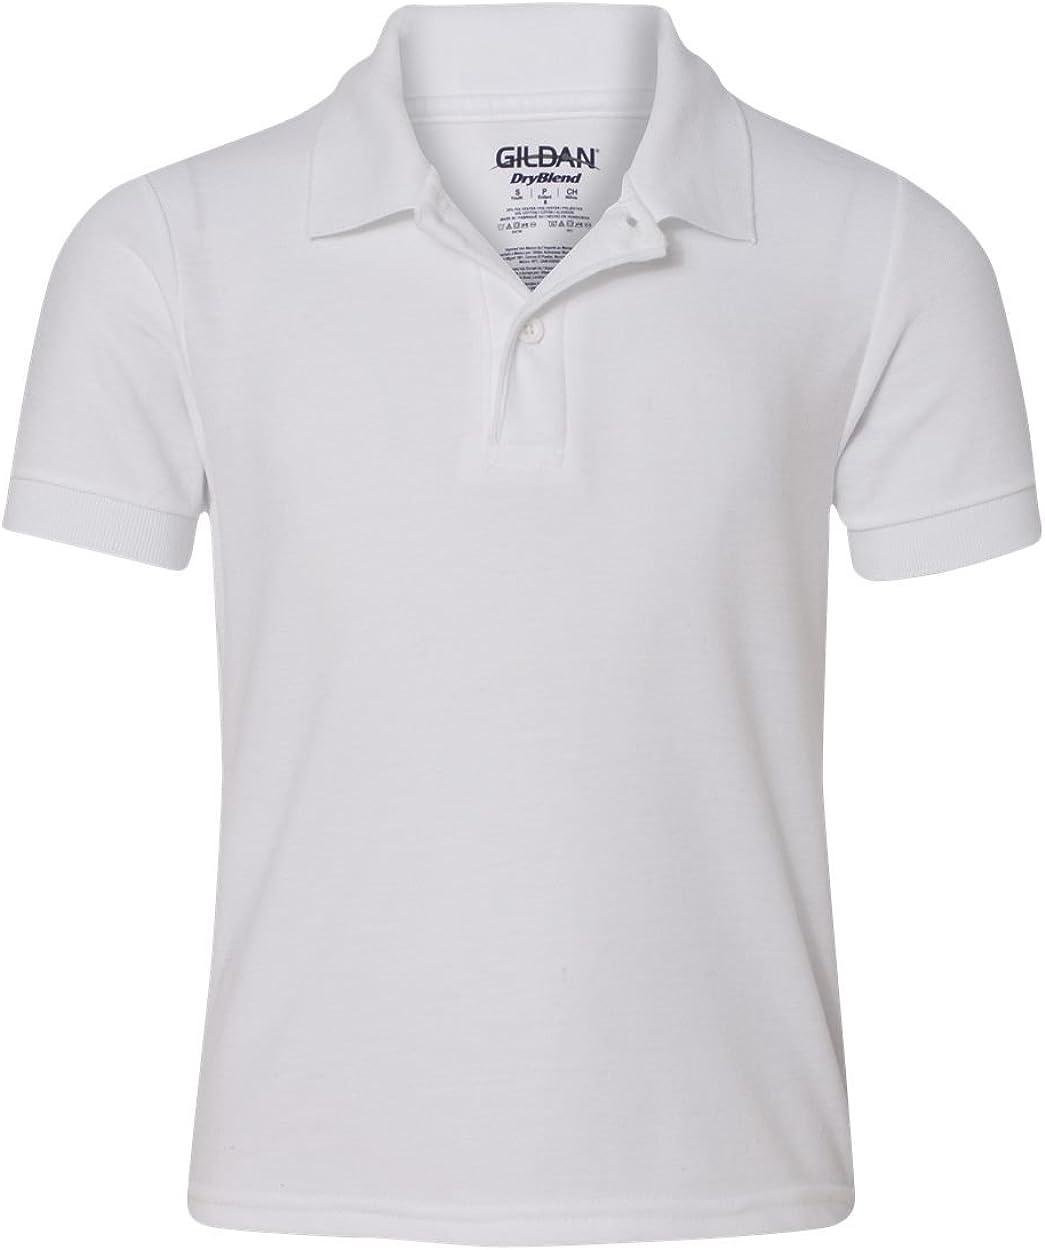 Gildan Activewear , M, White